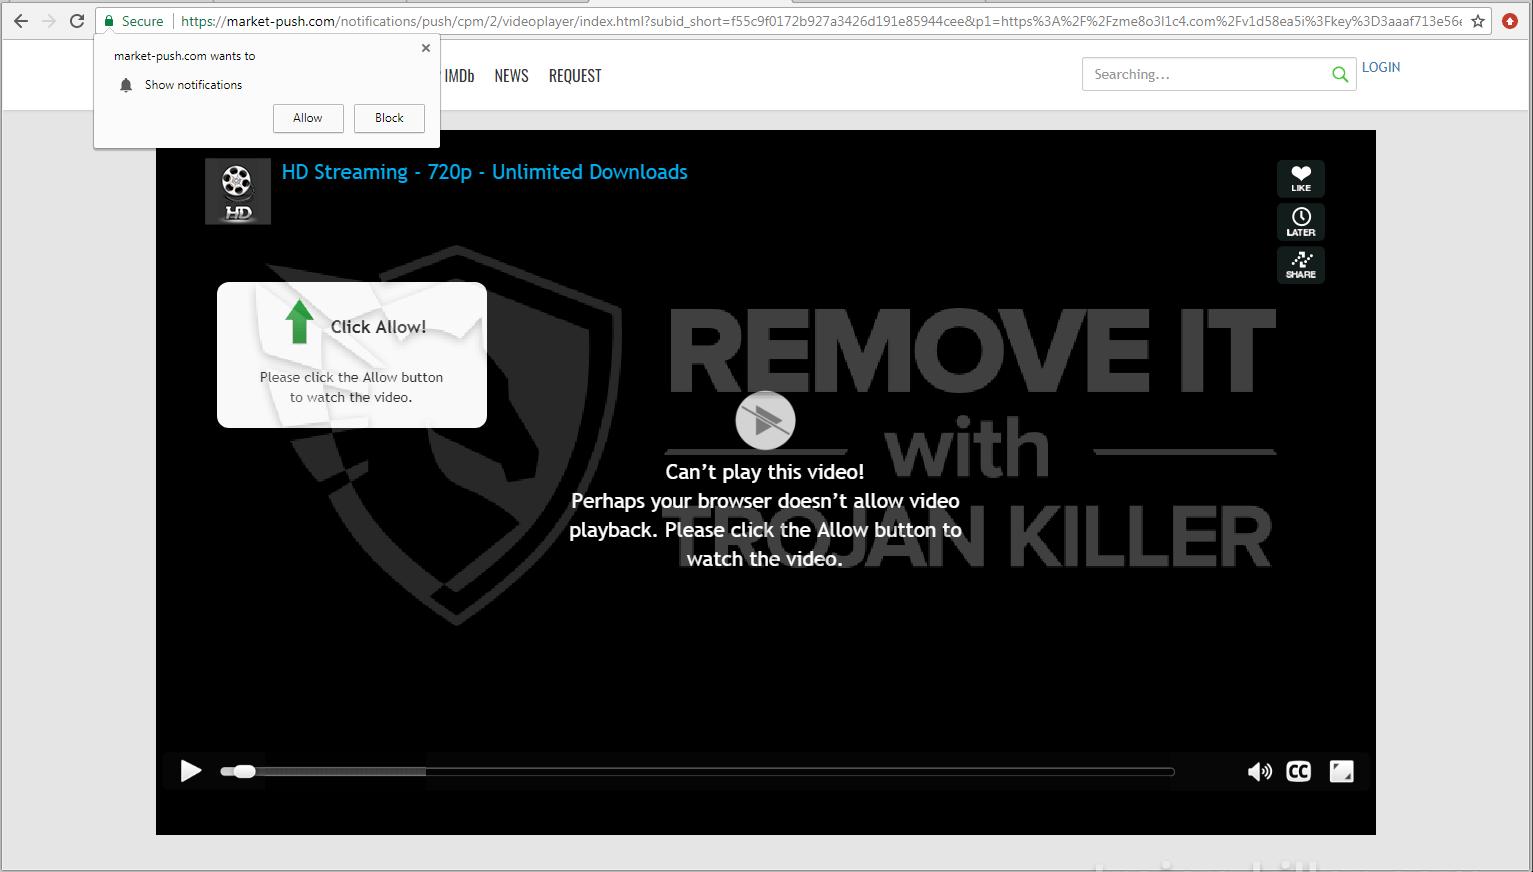 remove Market-push.com virus